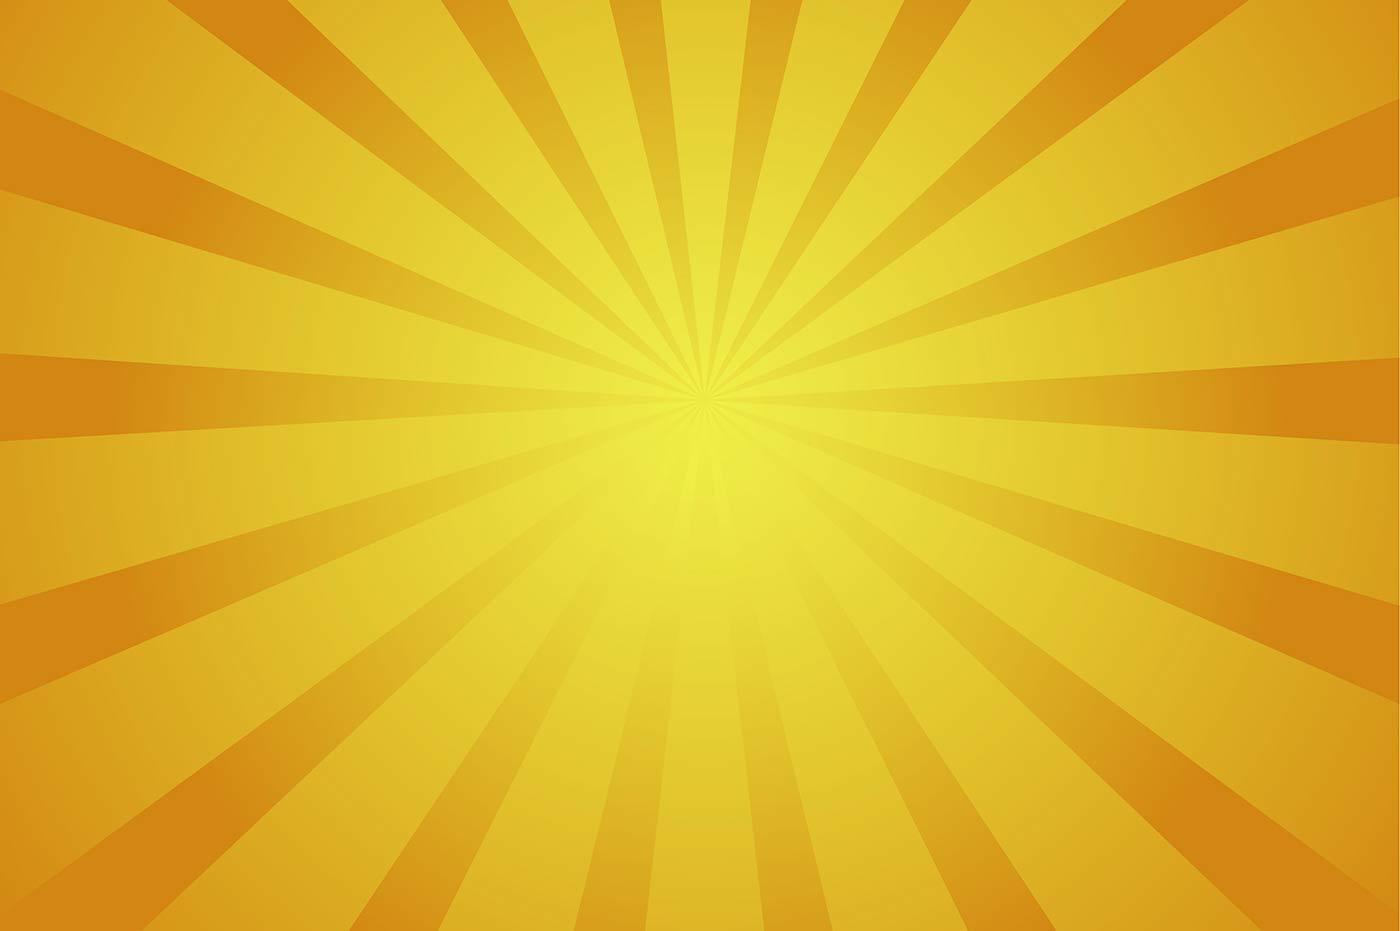 yellow rays vector - photo #13